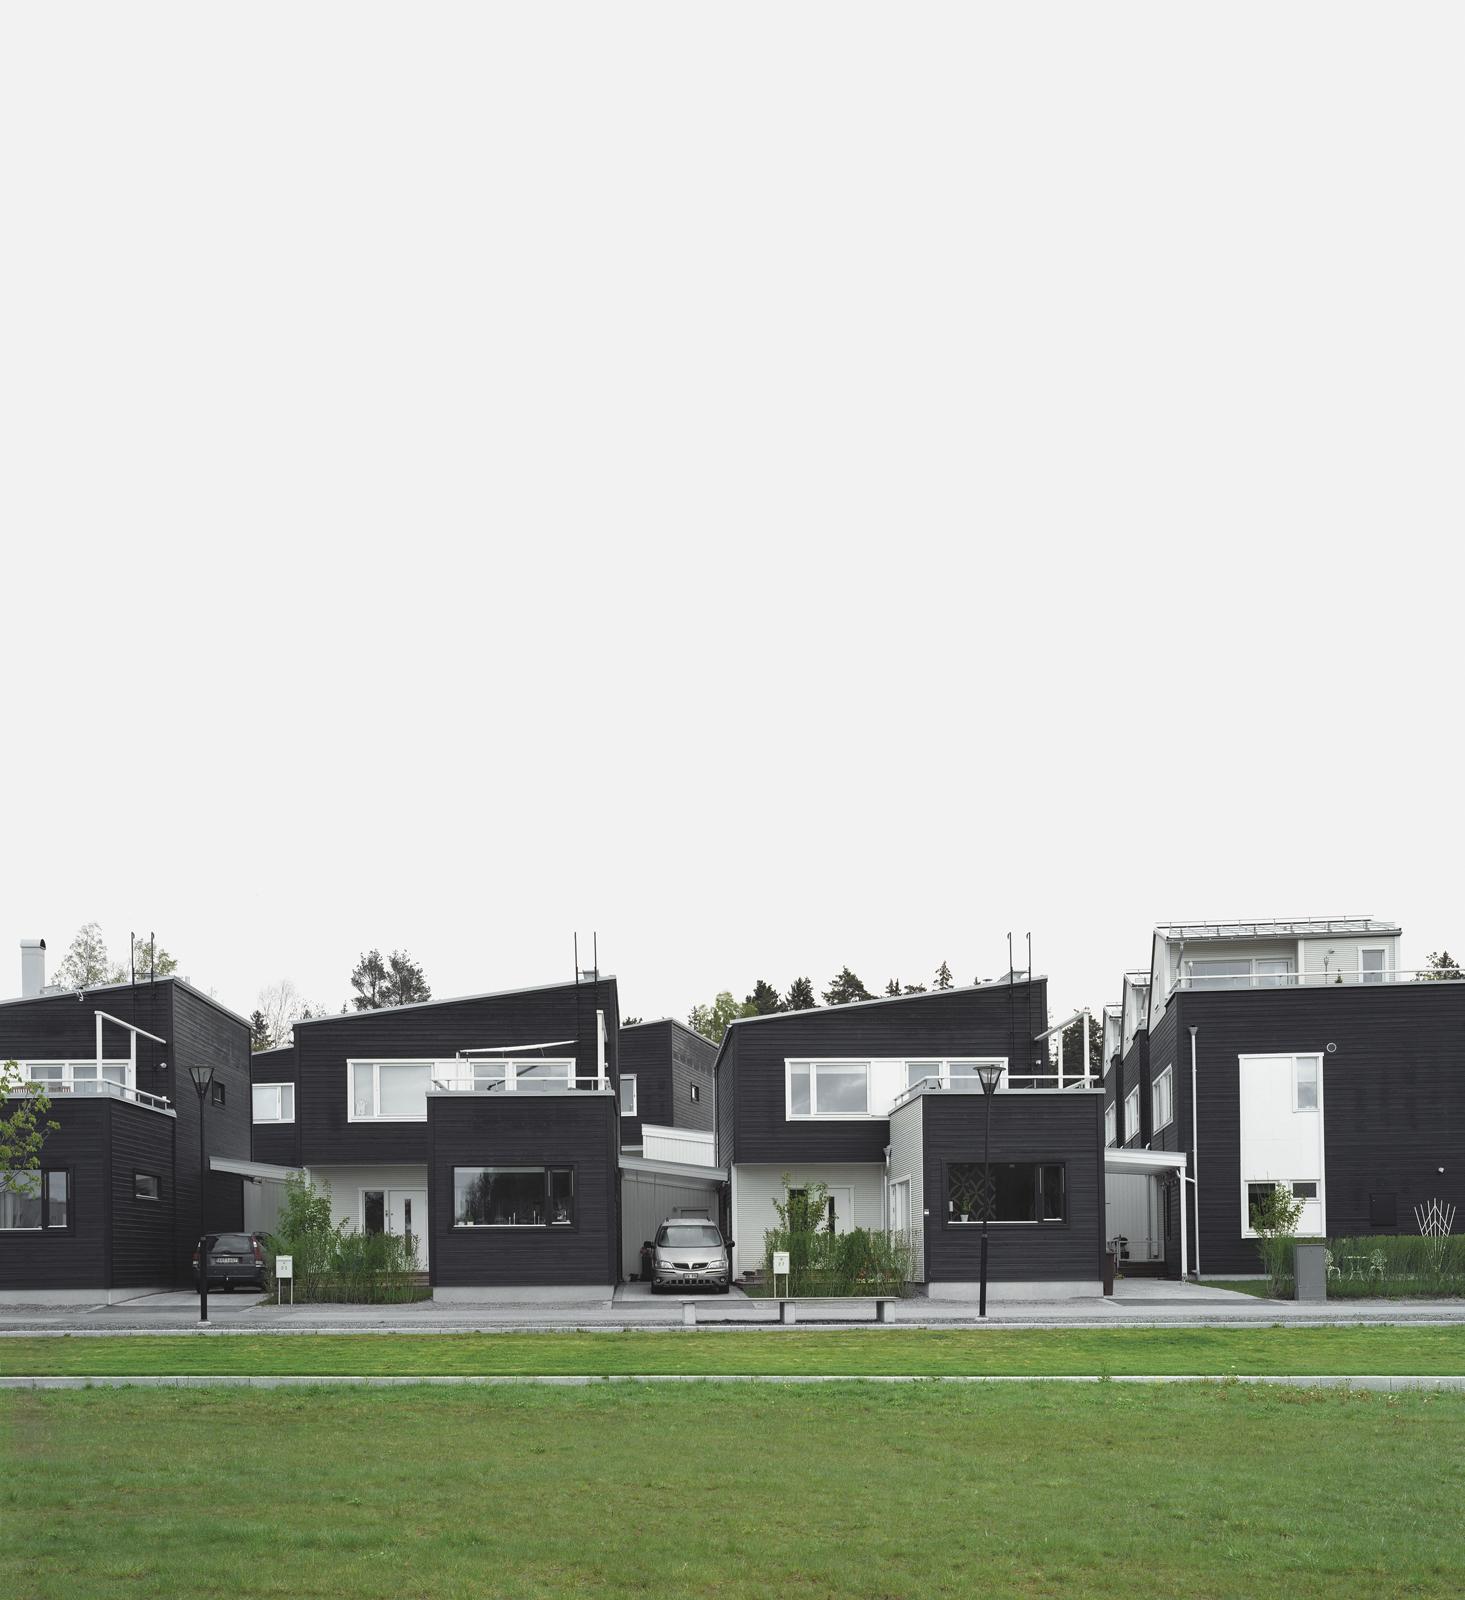 smedshammar holmberg silverdal terrace i exterior